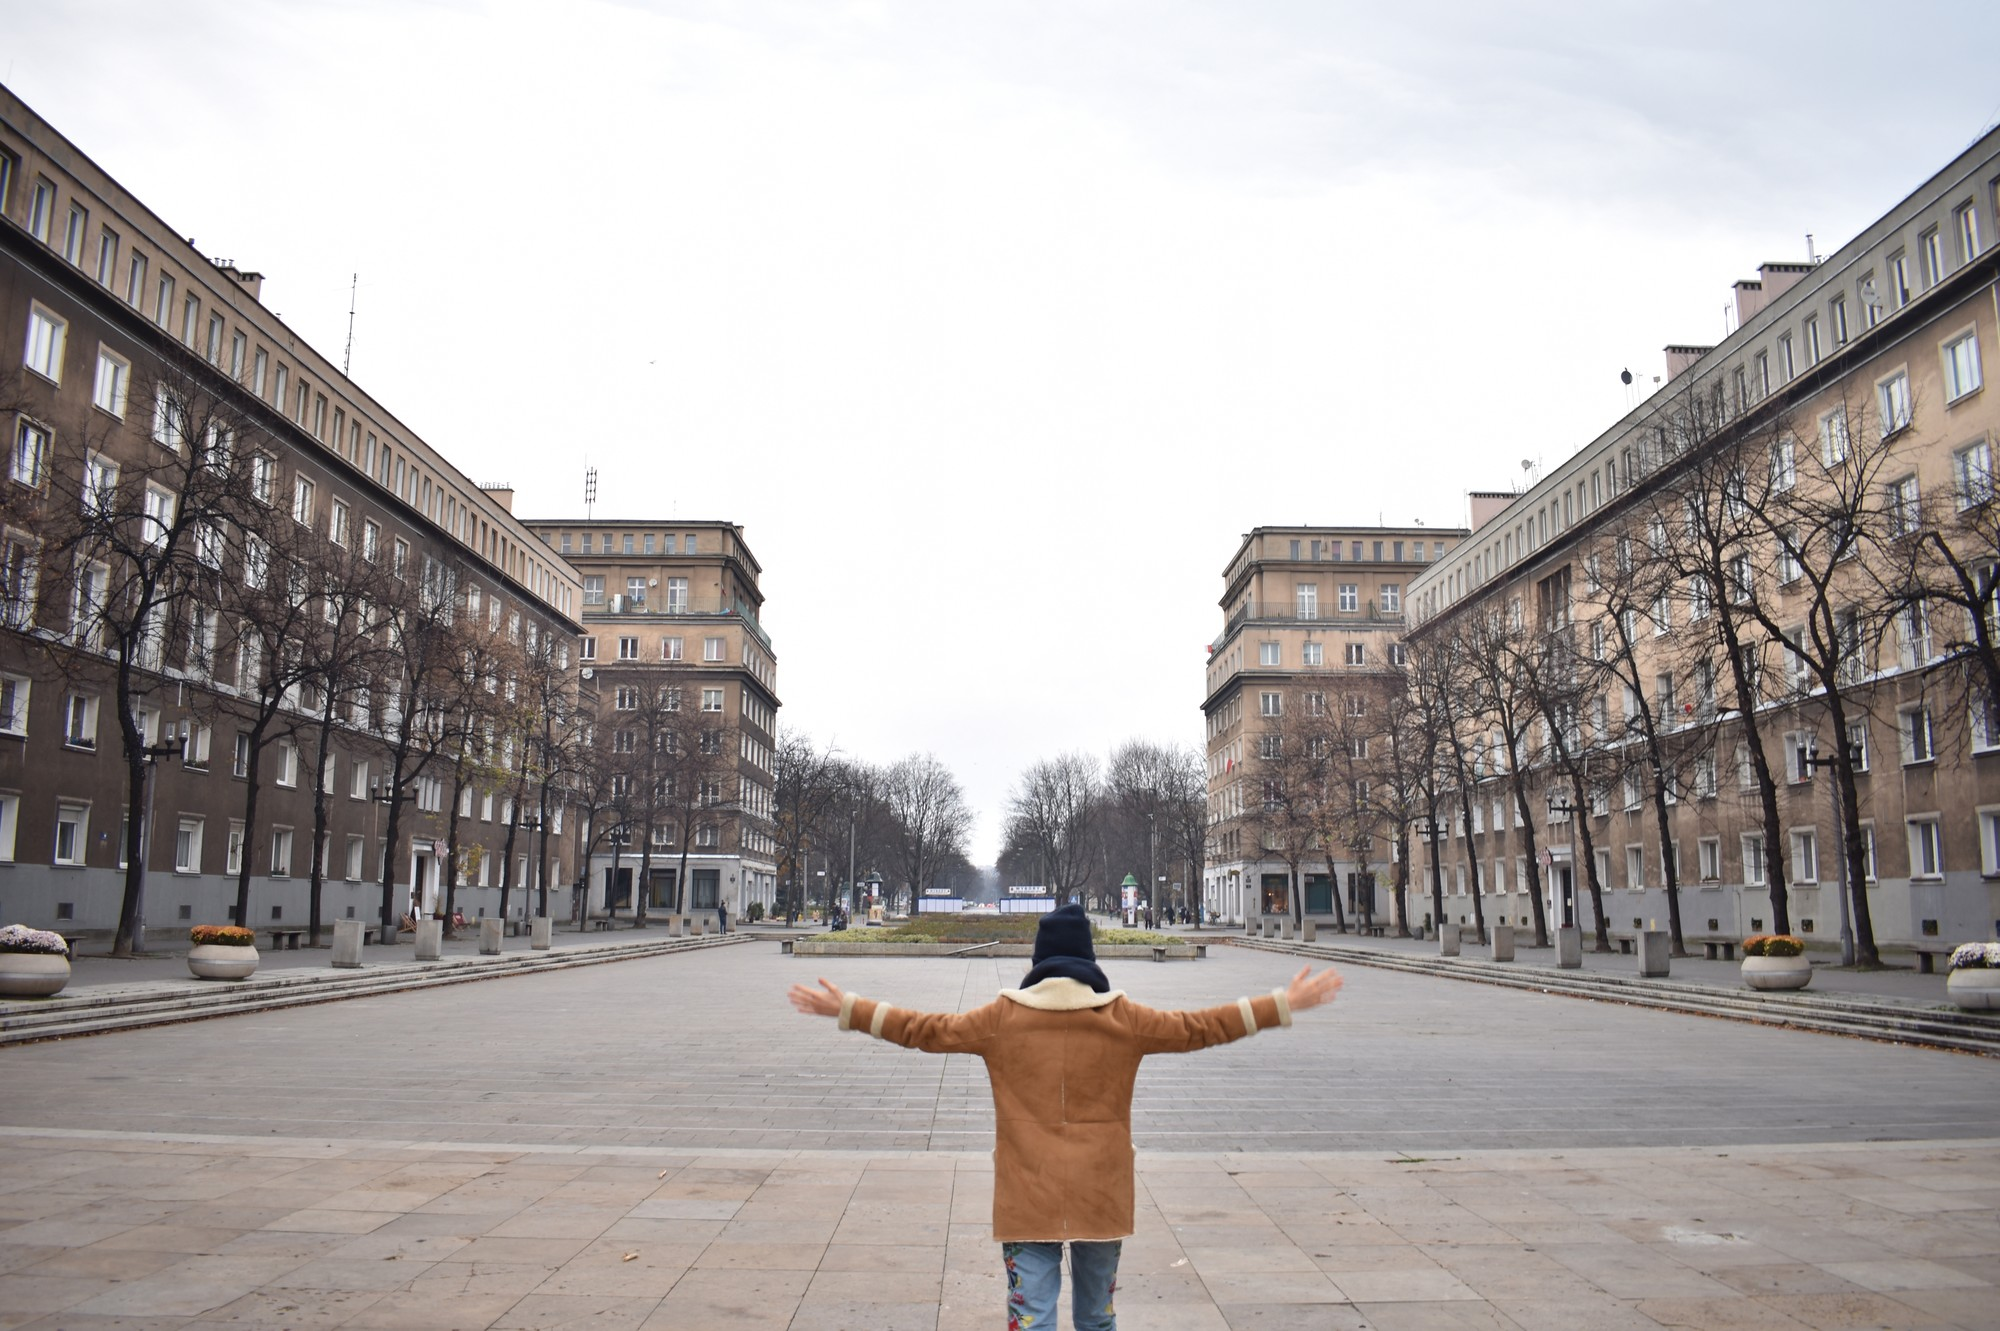 Nowa Huta: Kraków's Socialist Realism Suburb